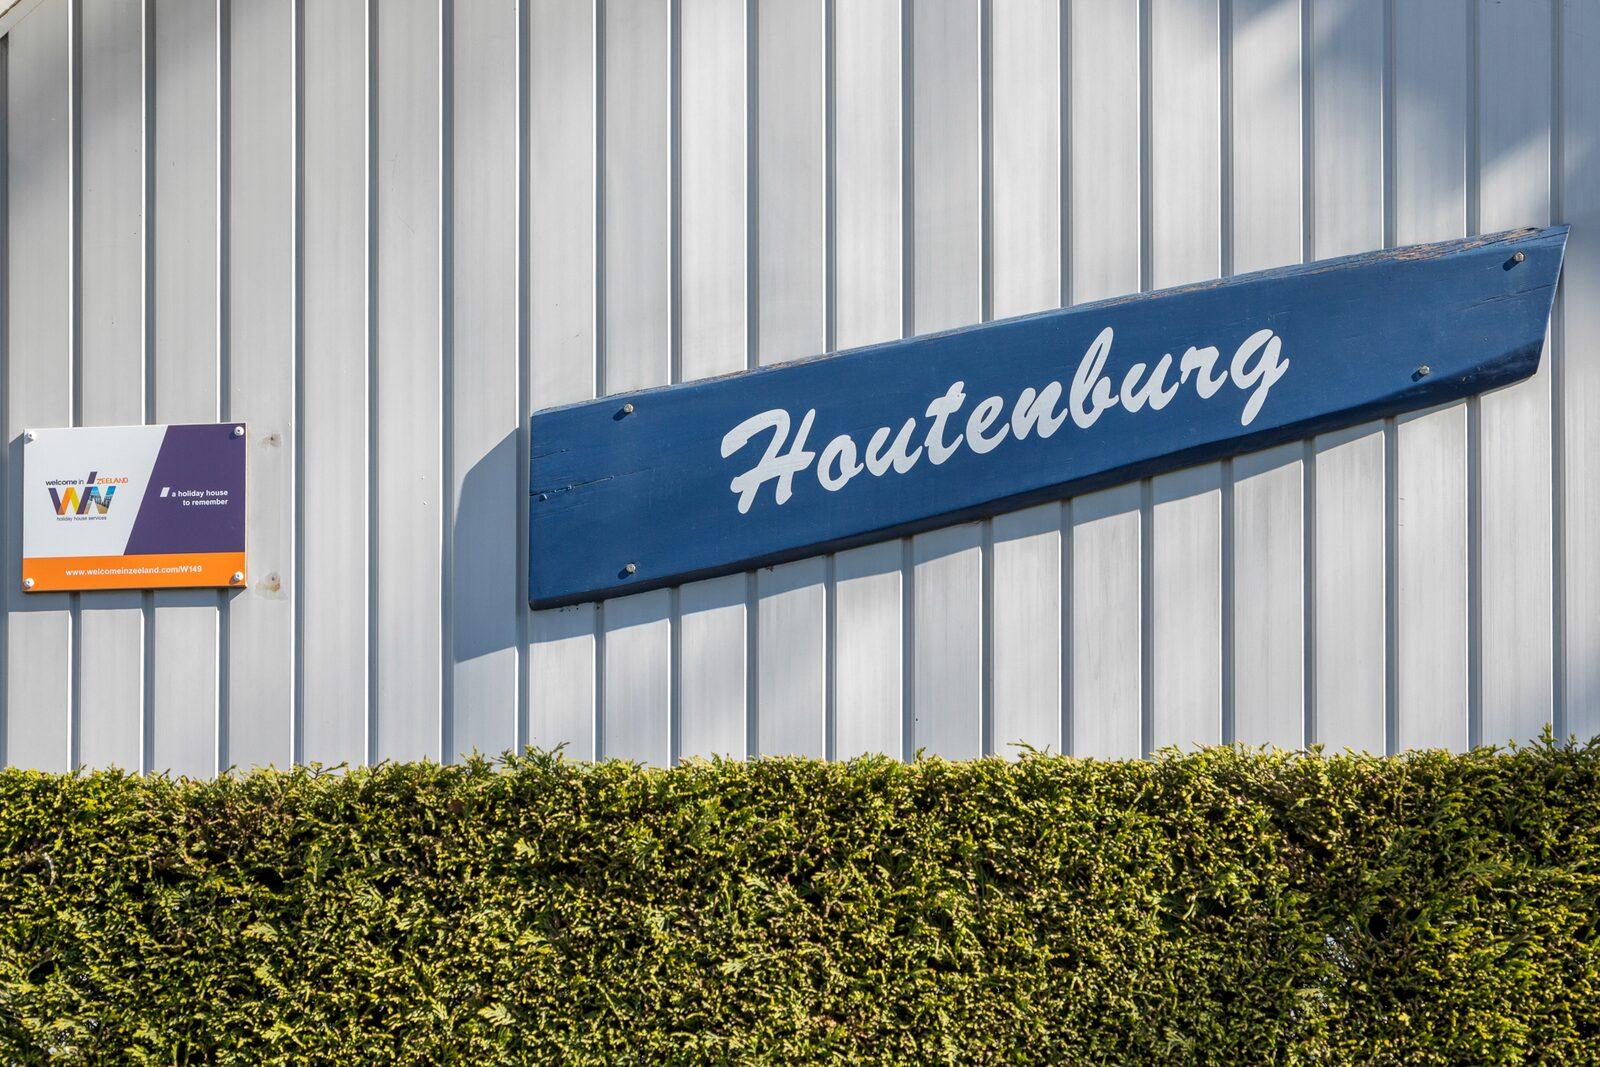 Holidayhouse - Noordendolfer 2-21 | Zoutelande